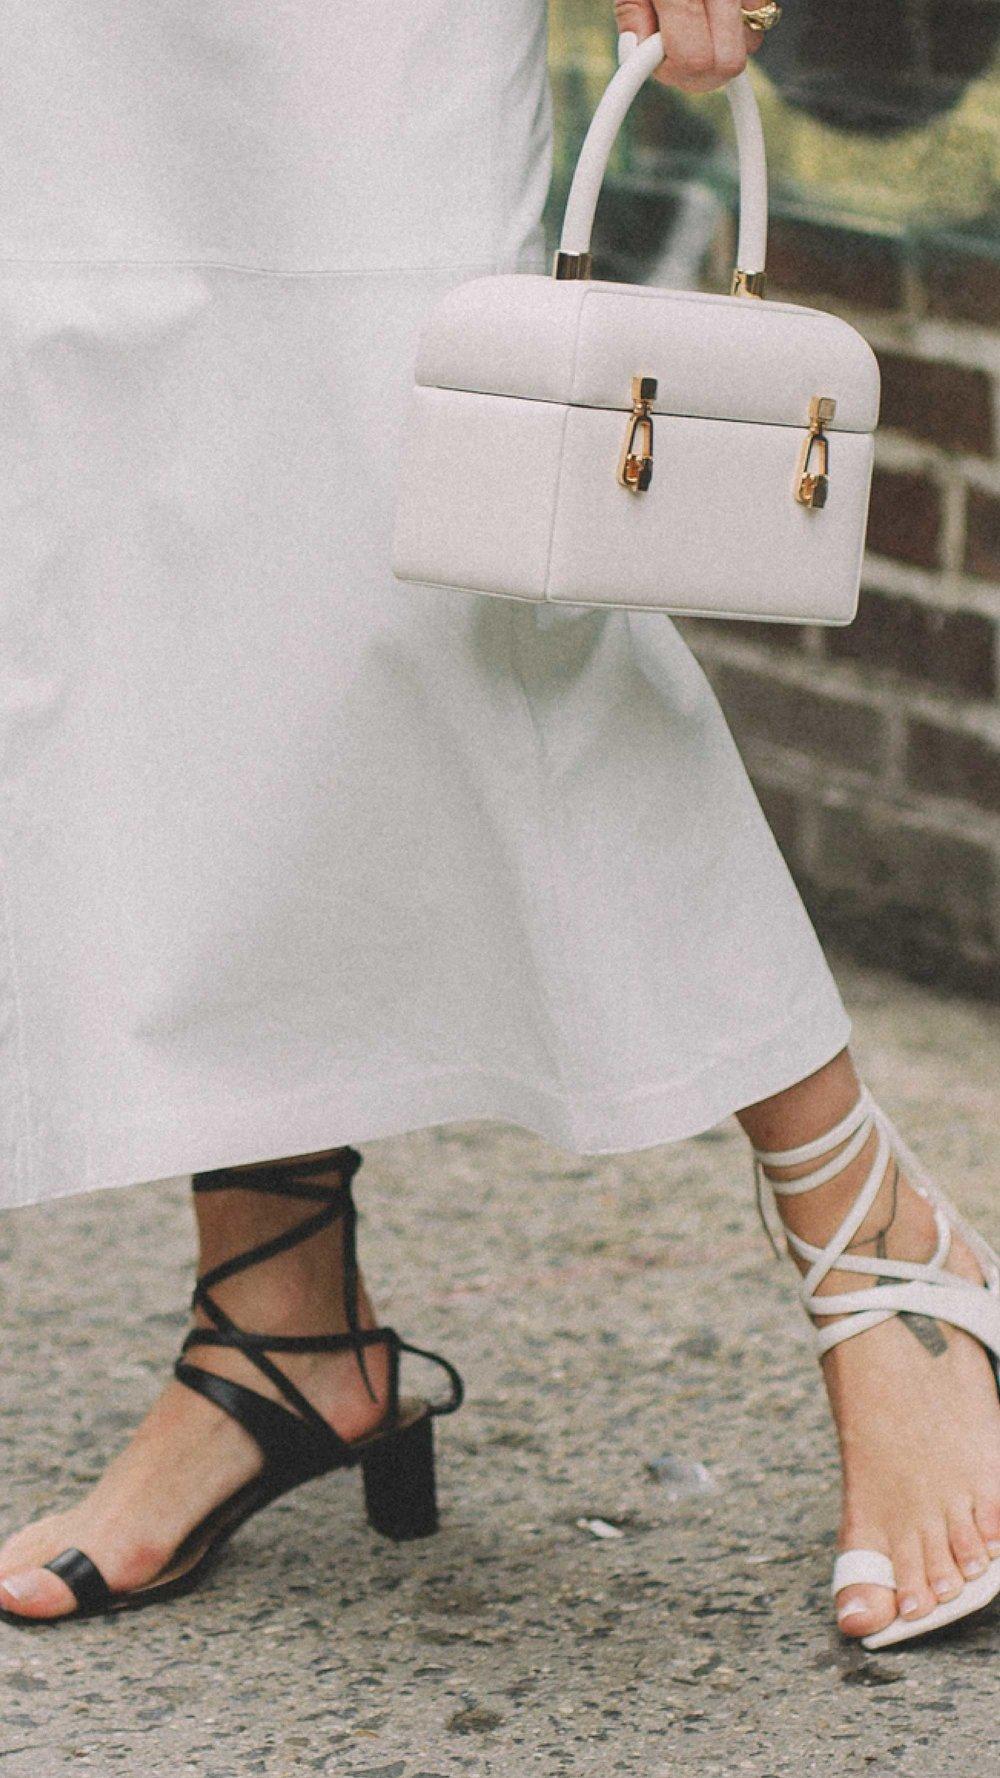 New-York-Fashion-Week-NYFW-SS18-street-style-day-five-SS18-11.jpg